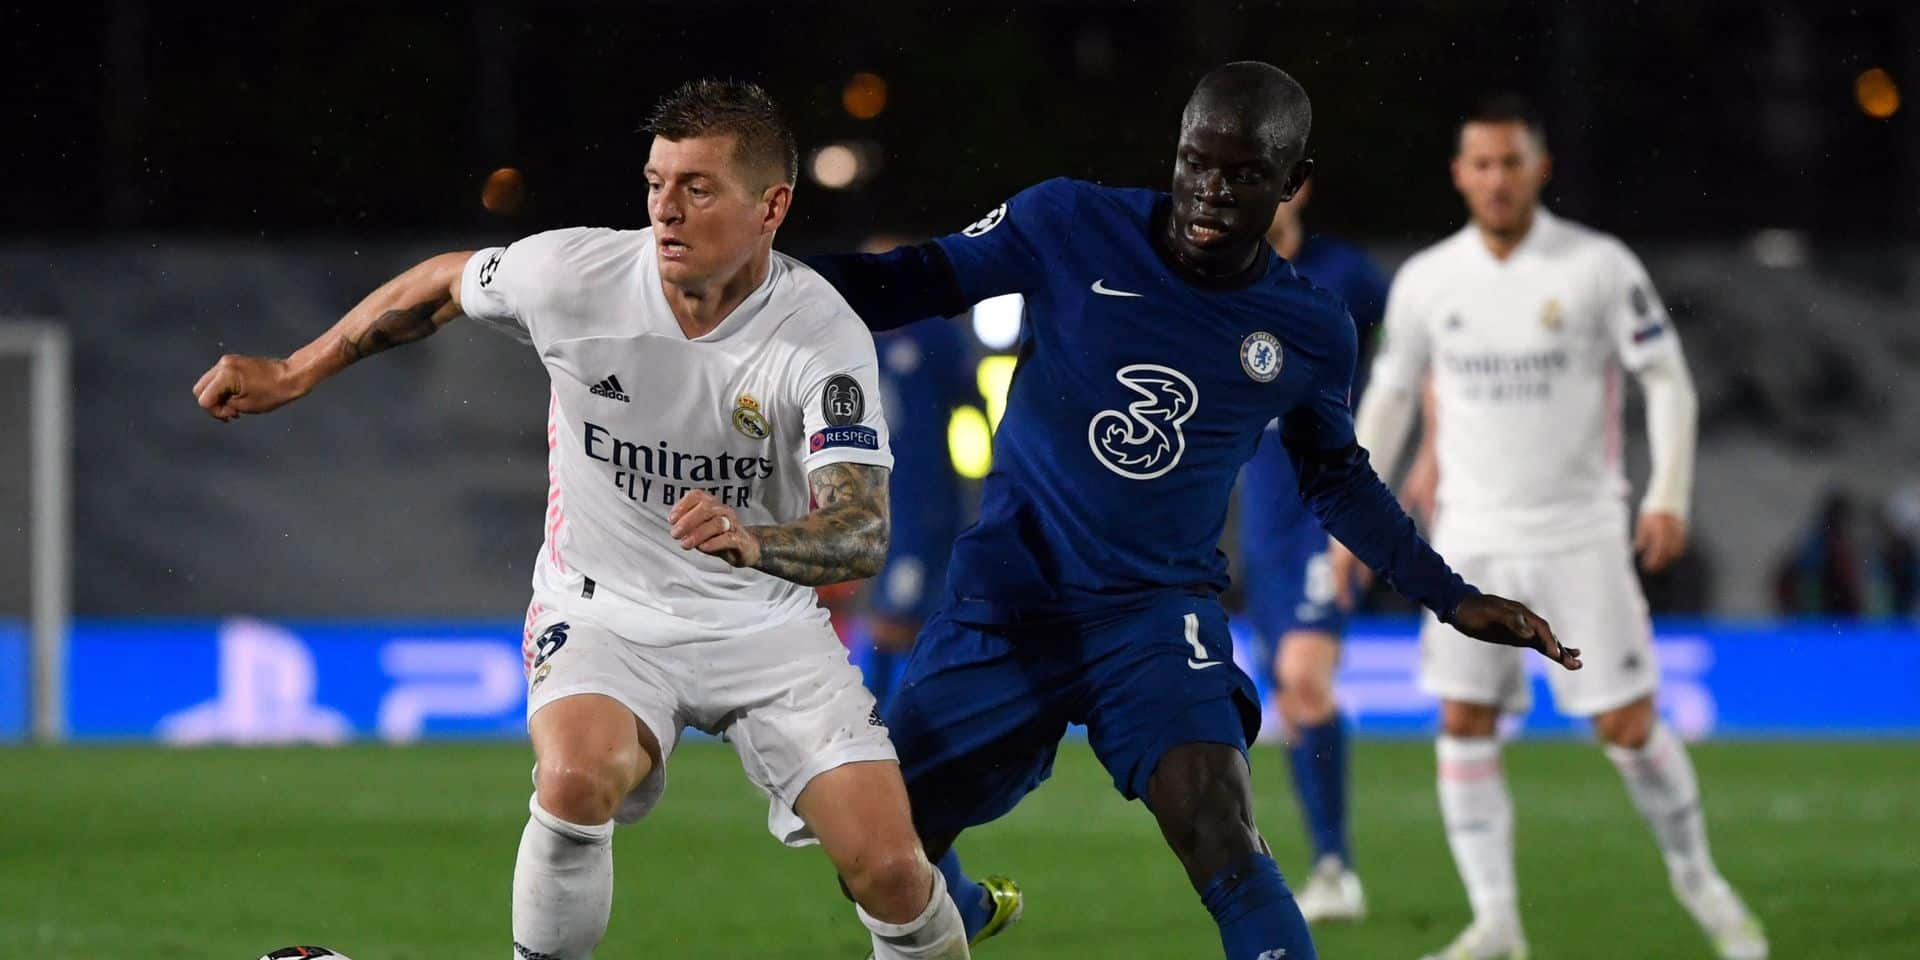 Real Madrid-Chelsea: pour le feu d'artifice, on attendra mercredi prochain